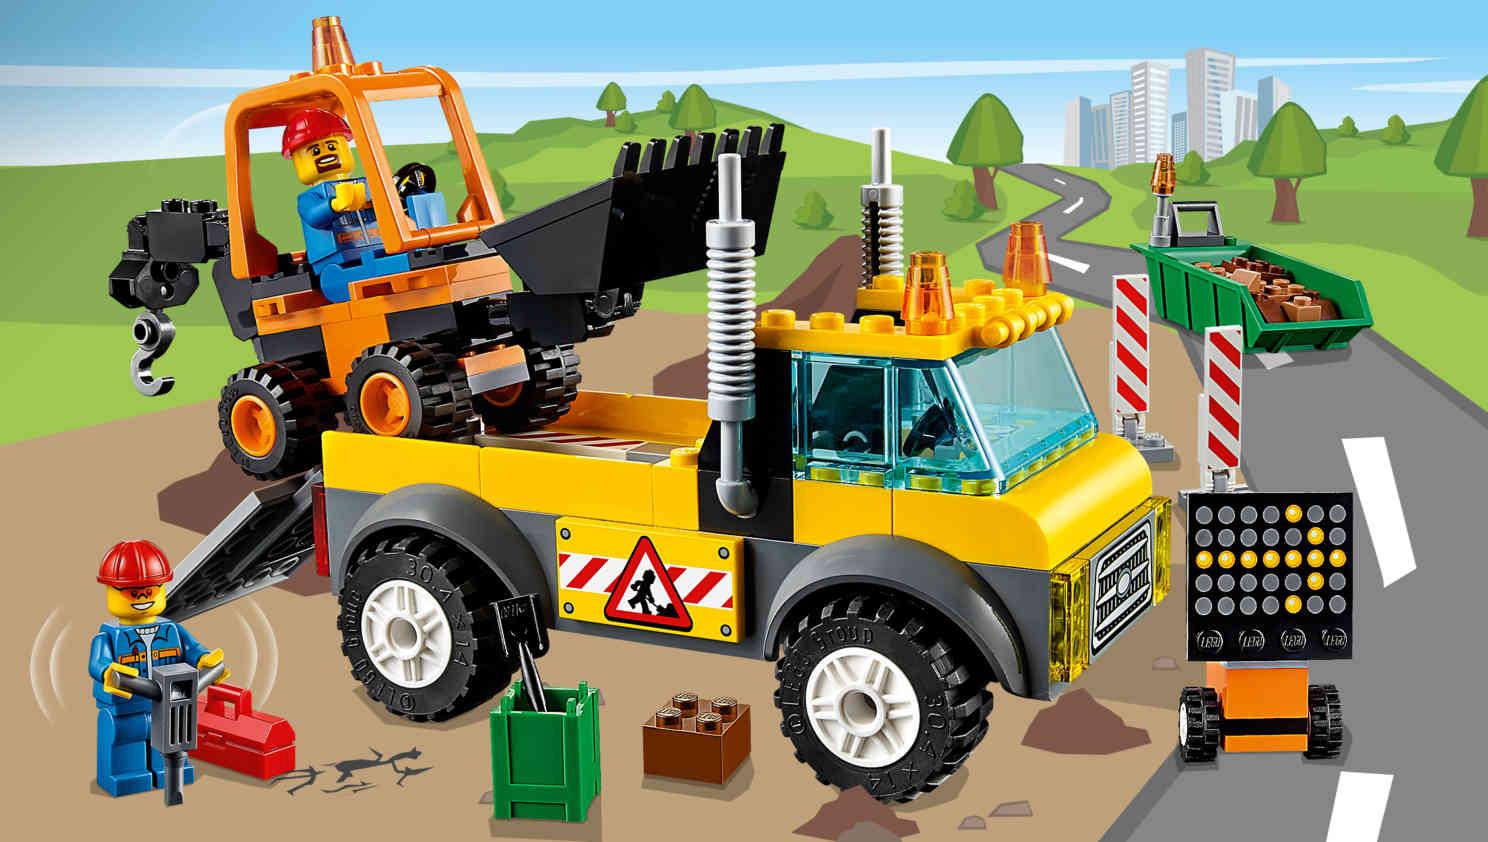 10683 le camion de chantier wiki lego fandom powered by wikia. Black Bedroom Furniture Sets. Home Design Ideas